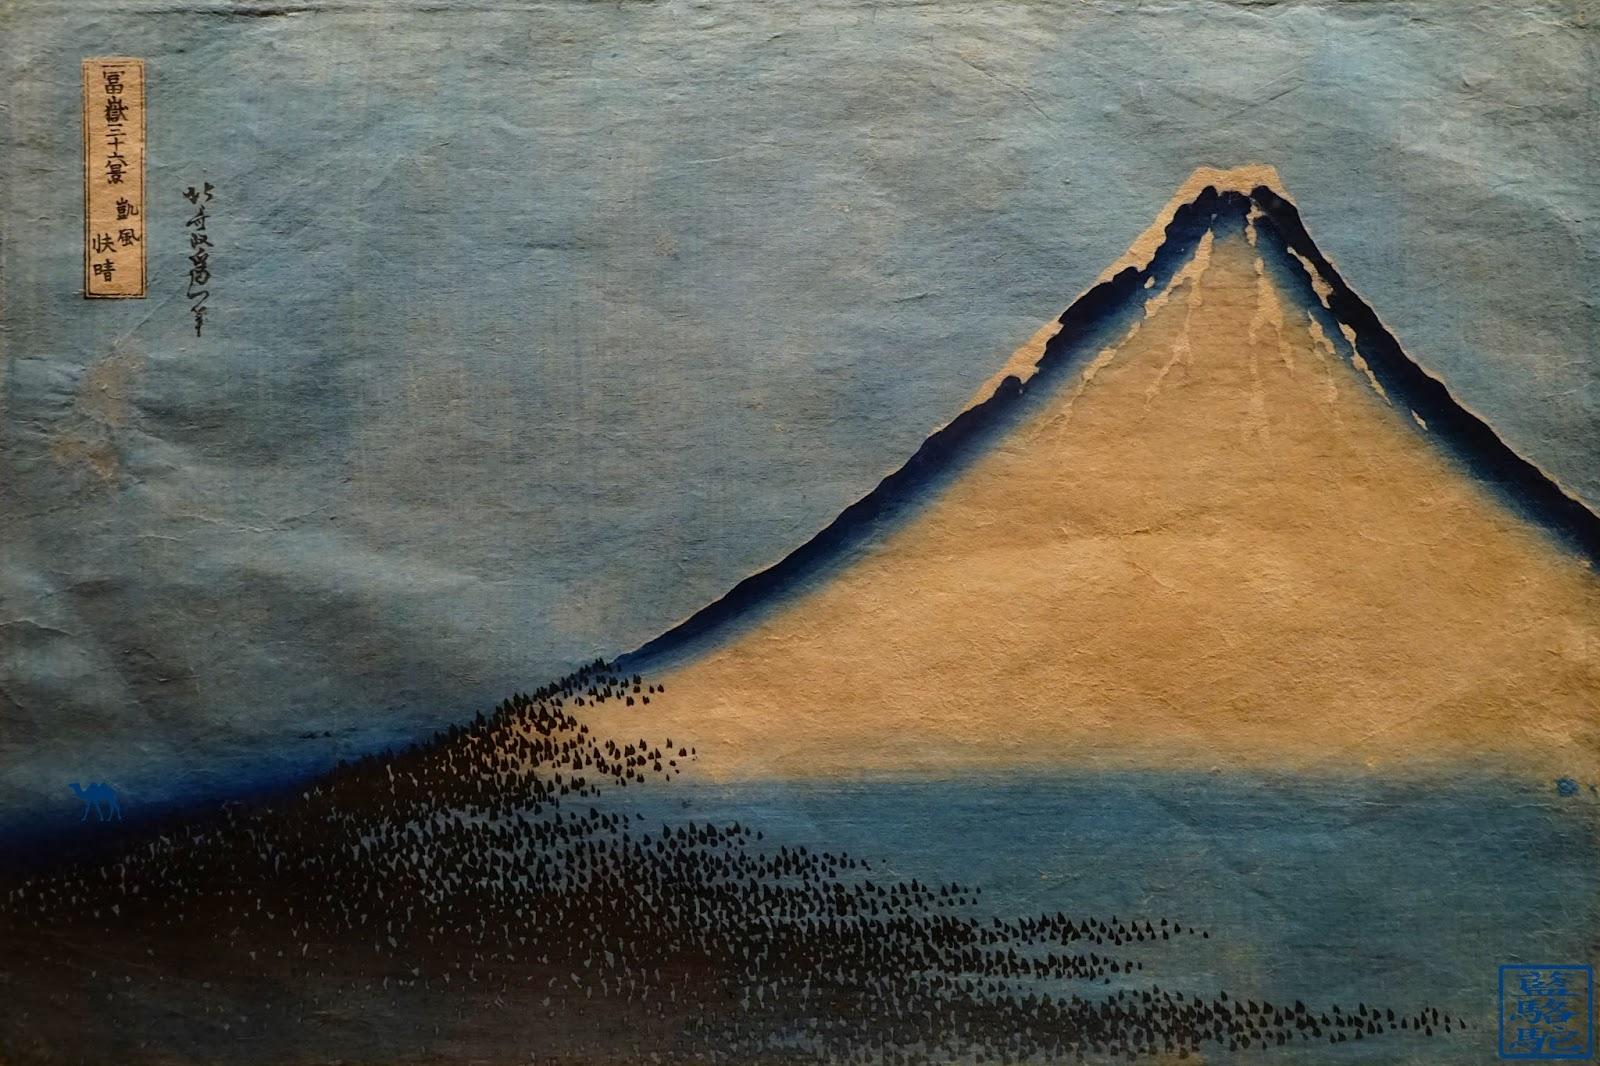 LE Chameau Bleu - Mont Fuji - Estampes - Mnaag